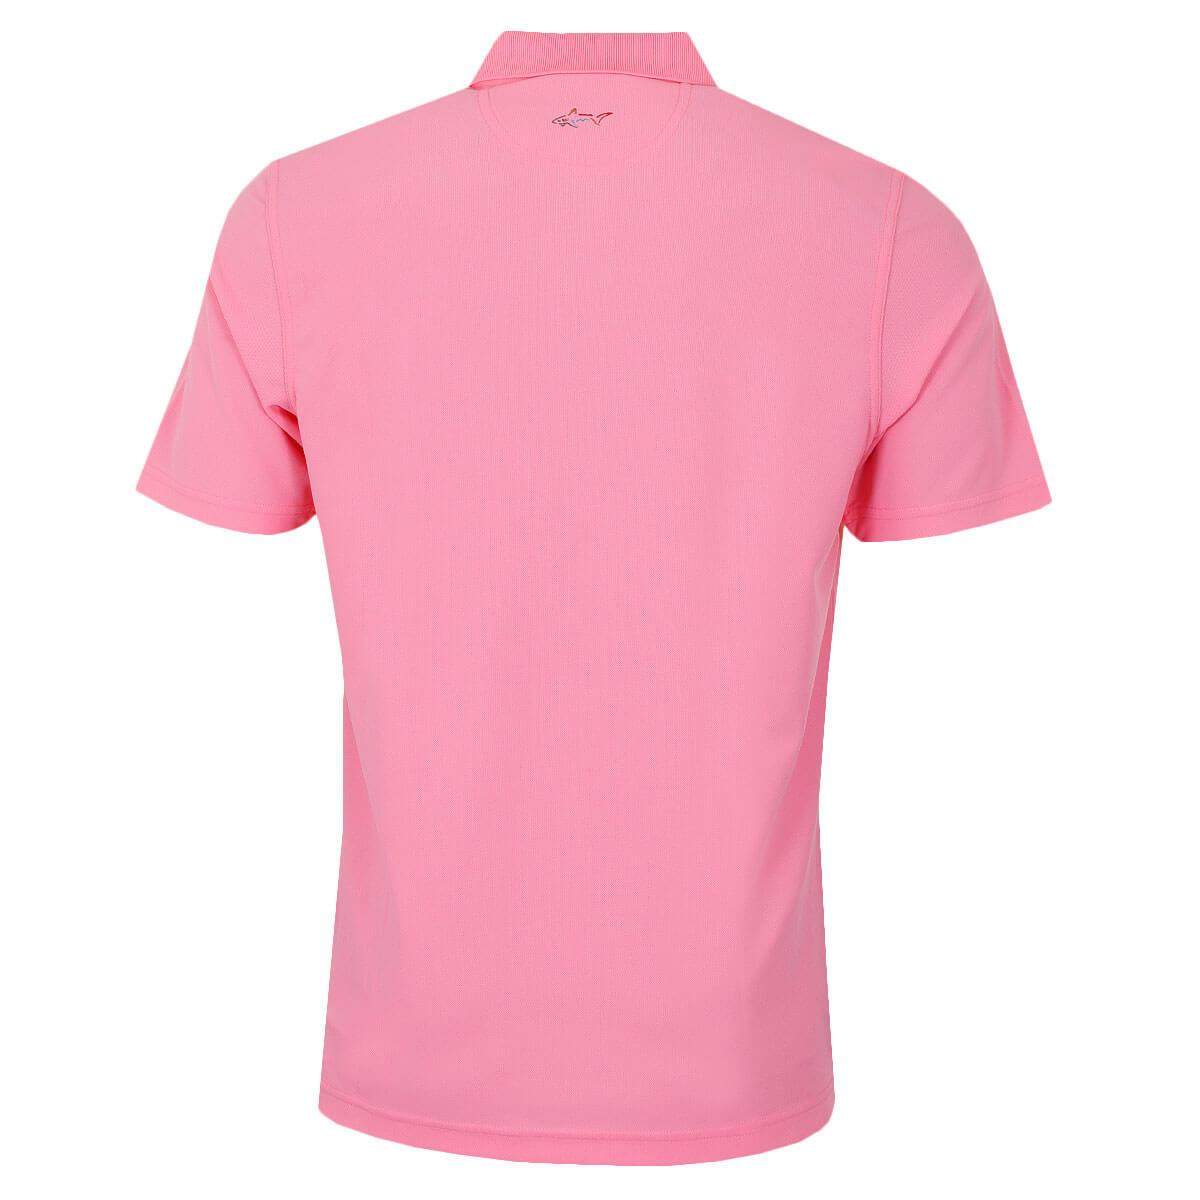 Greg-Norman-Mens-KX04-Performance-Micro-Pique-Golf-Polo-Shirt-28-OFF-RRP thumbnail 55